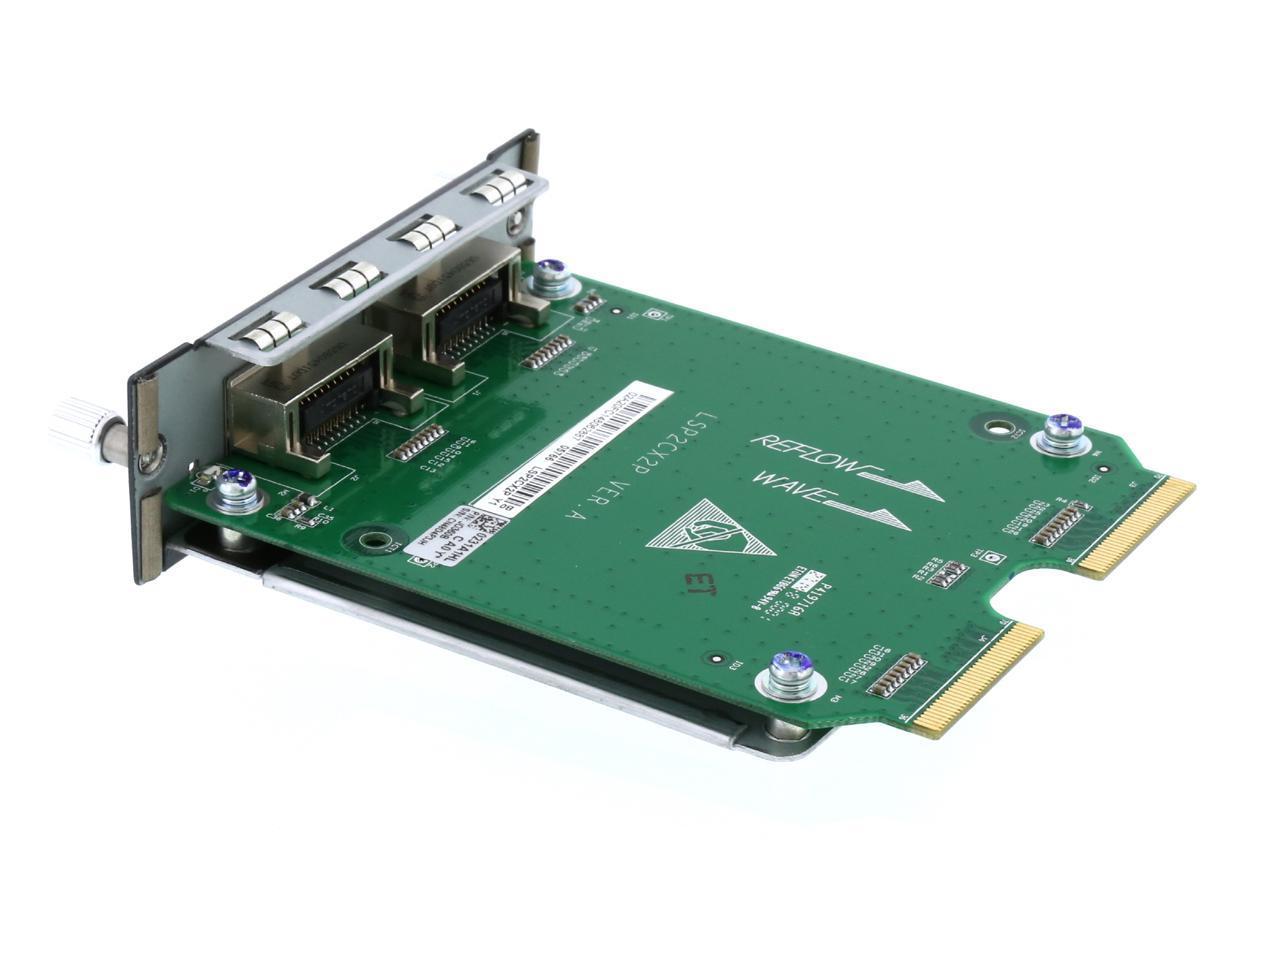 Hewlett Packard Enterprise 5500 2-port 10GbE Local Connect Module